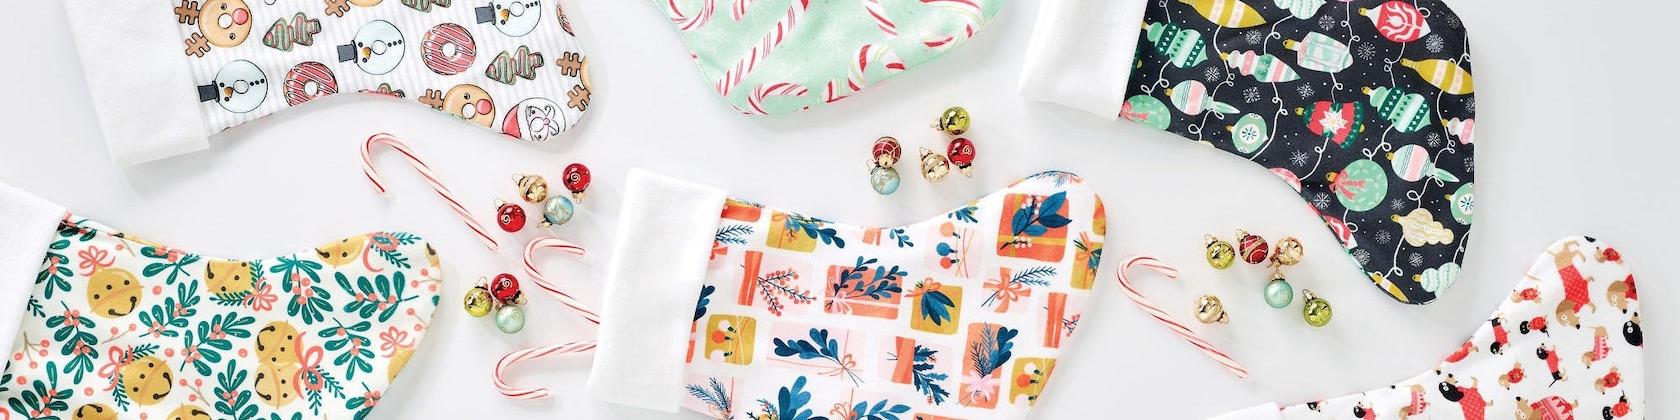 Spoonflower Custom Fabrics And Wallpapers Par Spoonflower